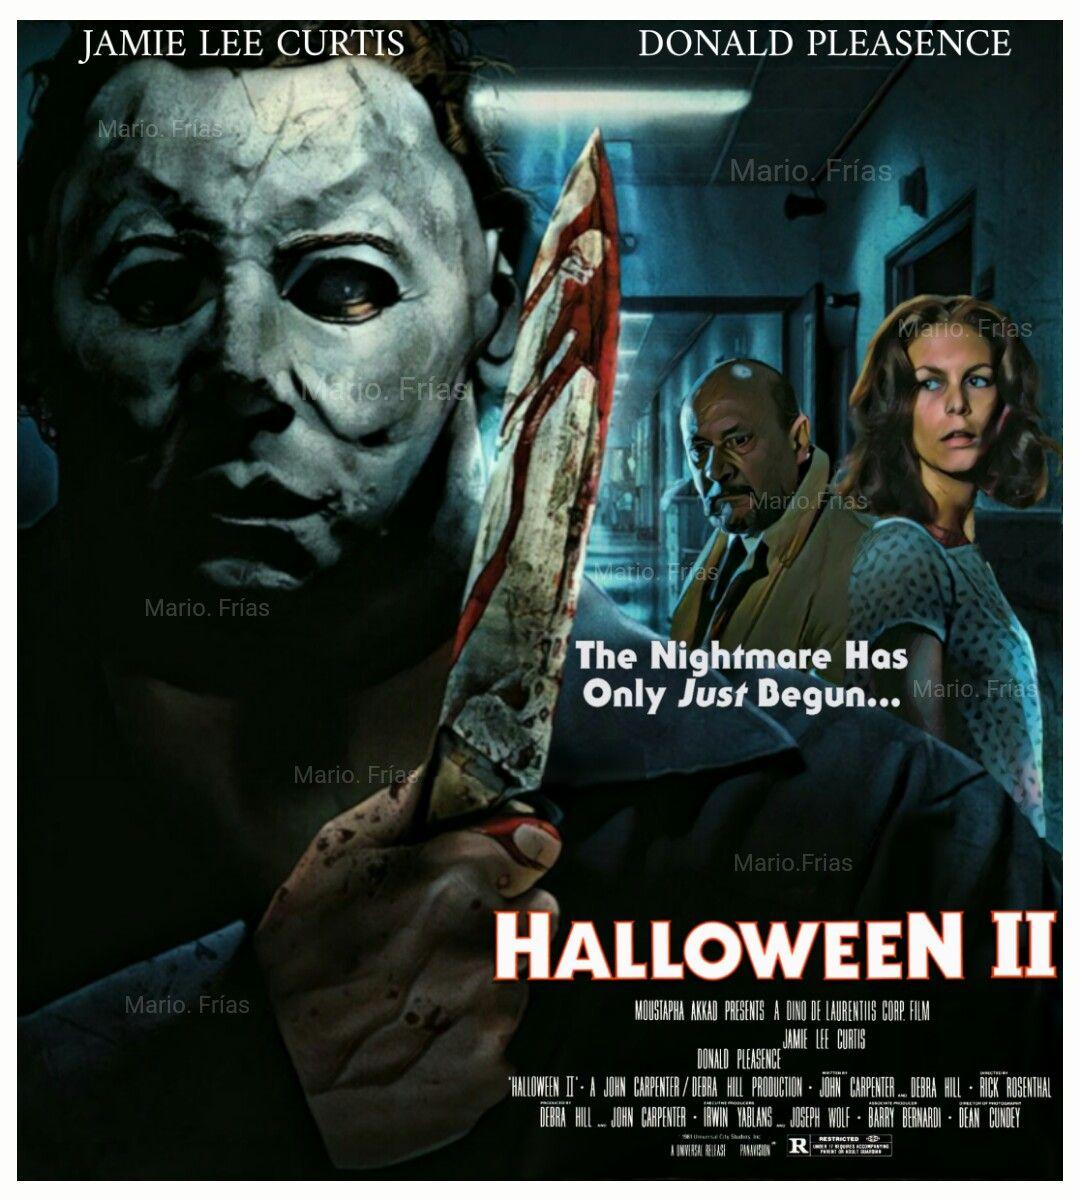 Halloween 2 1981 Horror Movie Slasher Re Edit By Mario. Frías ...